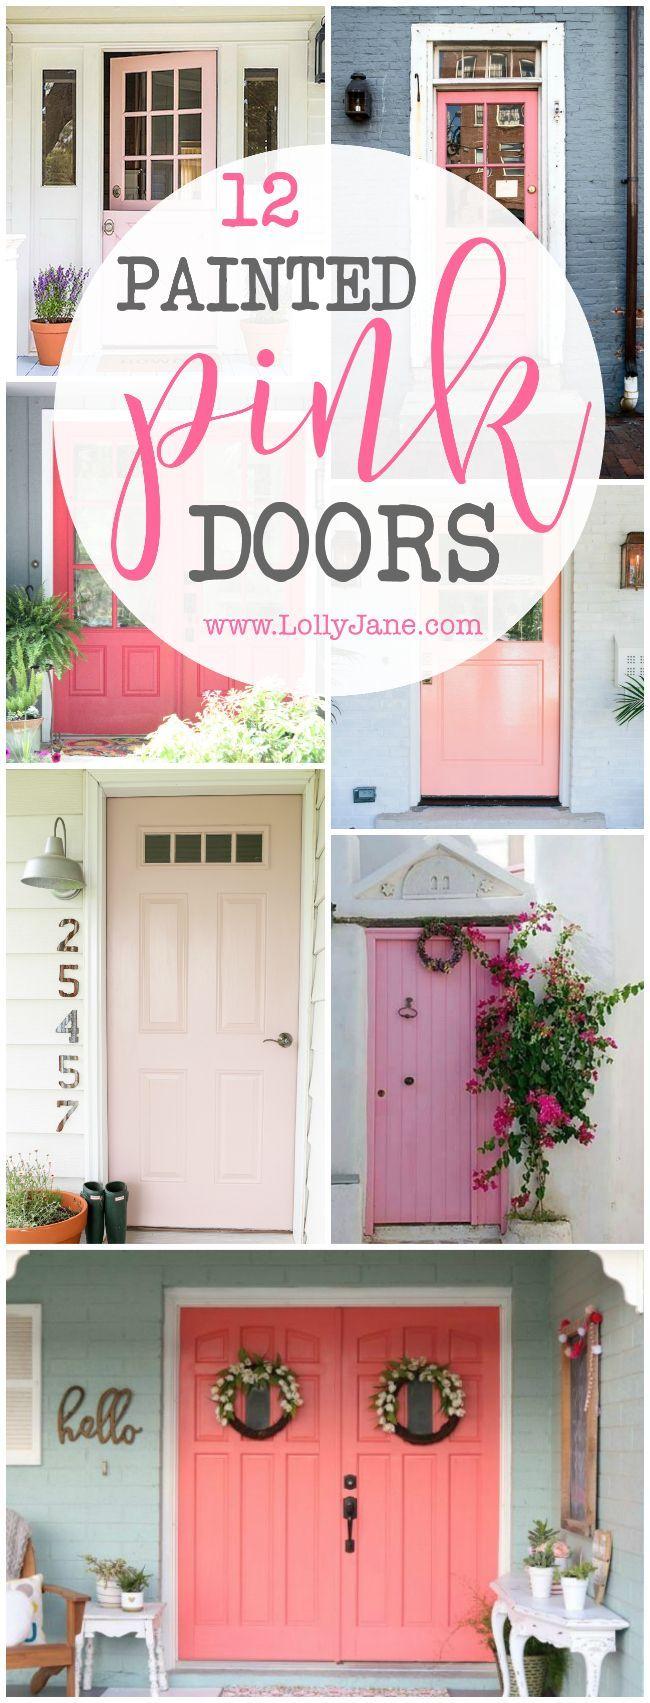 12 painted pink door ideas, sooo cute! LOVE this pink front doors, such fun ways...